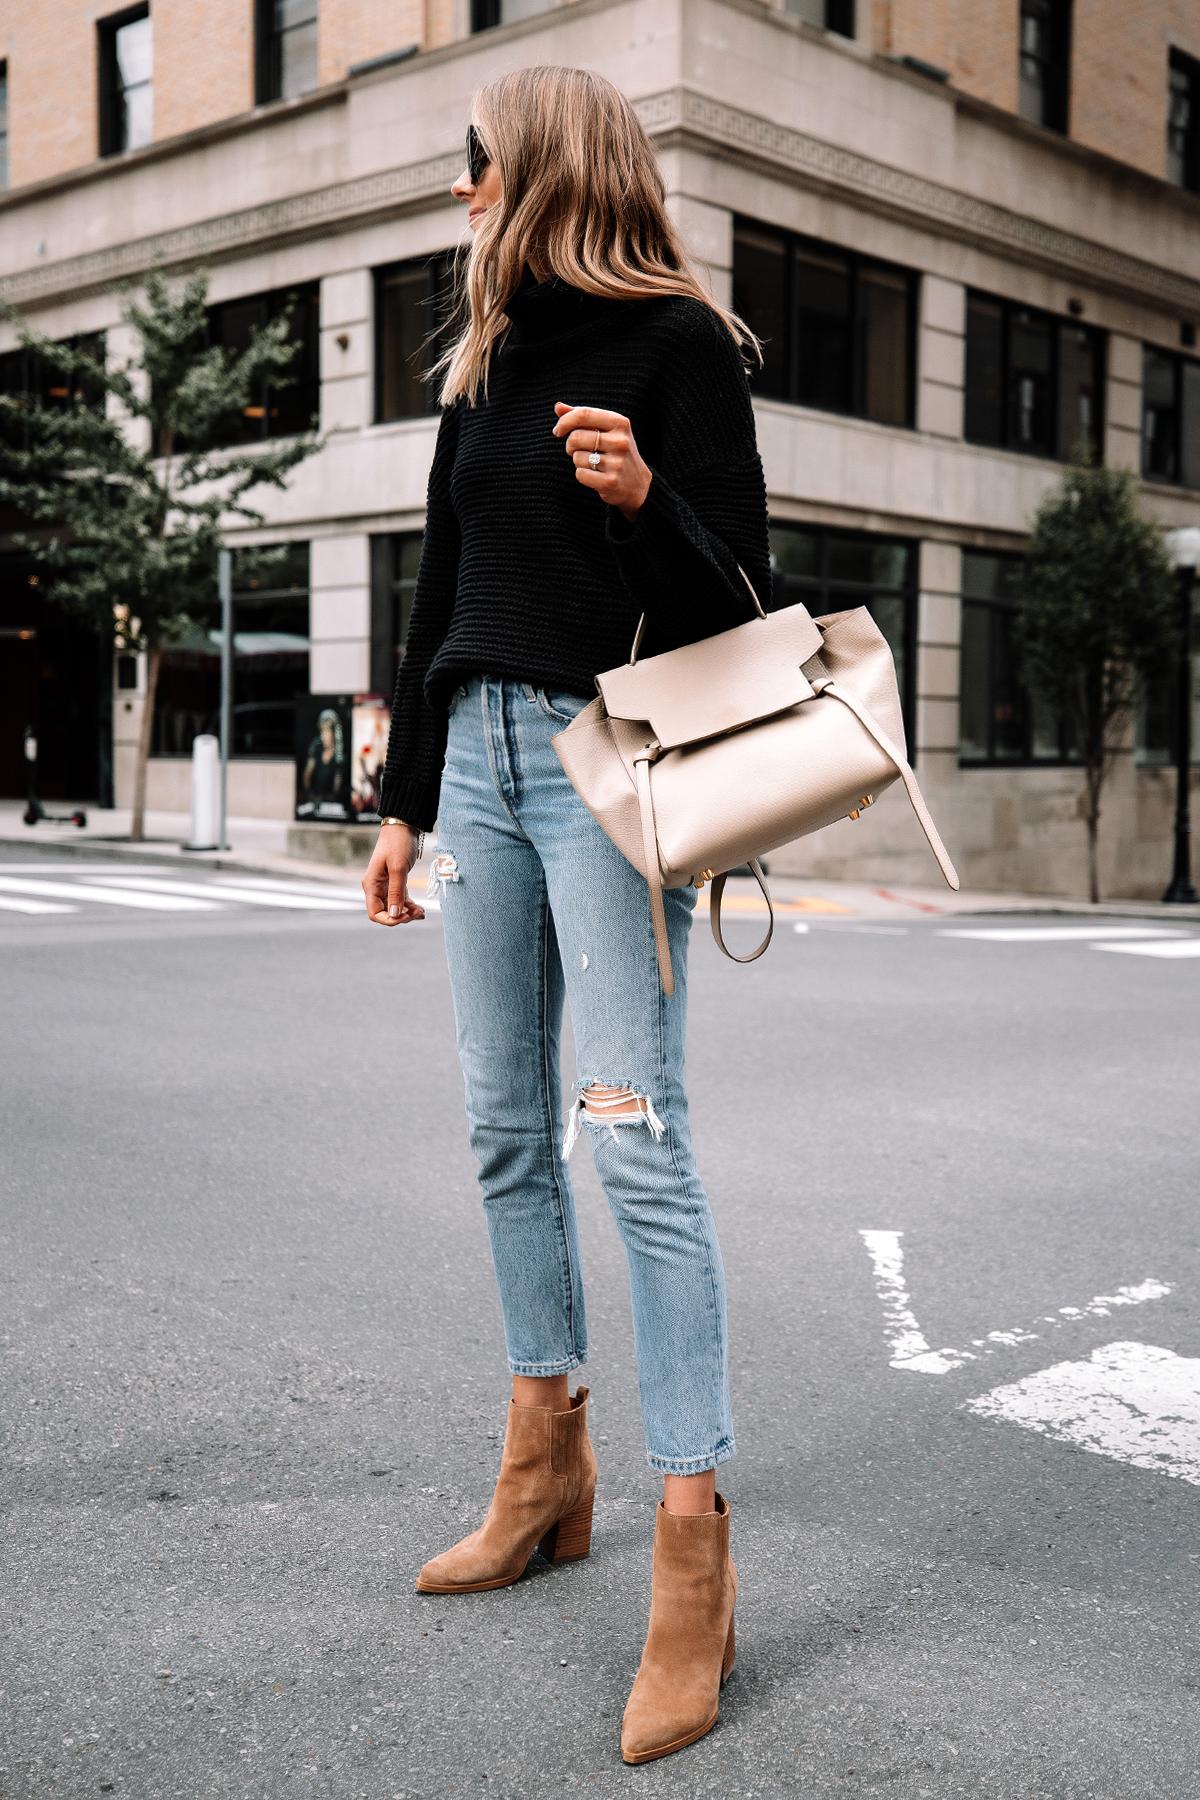 Fashion Jackson Wearing Amazon Fashion Black Turtleneck Sweater Levis Ripped Jeans Tan Suede Booties 2